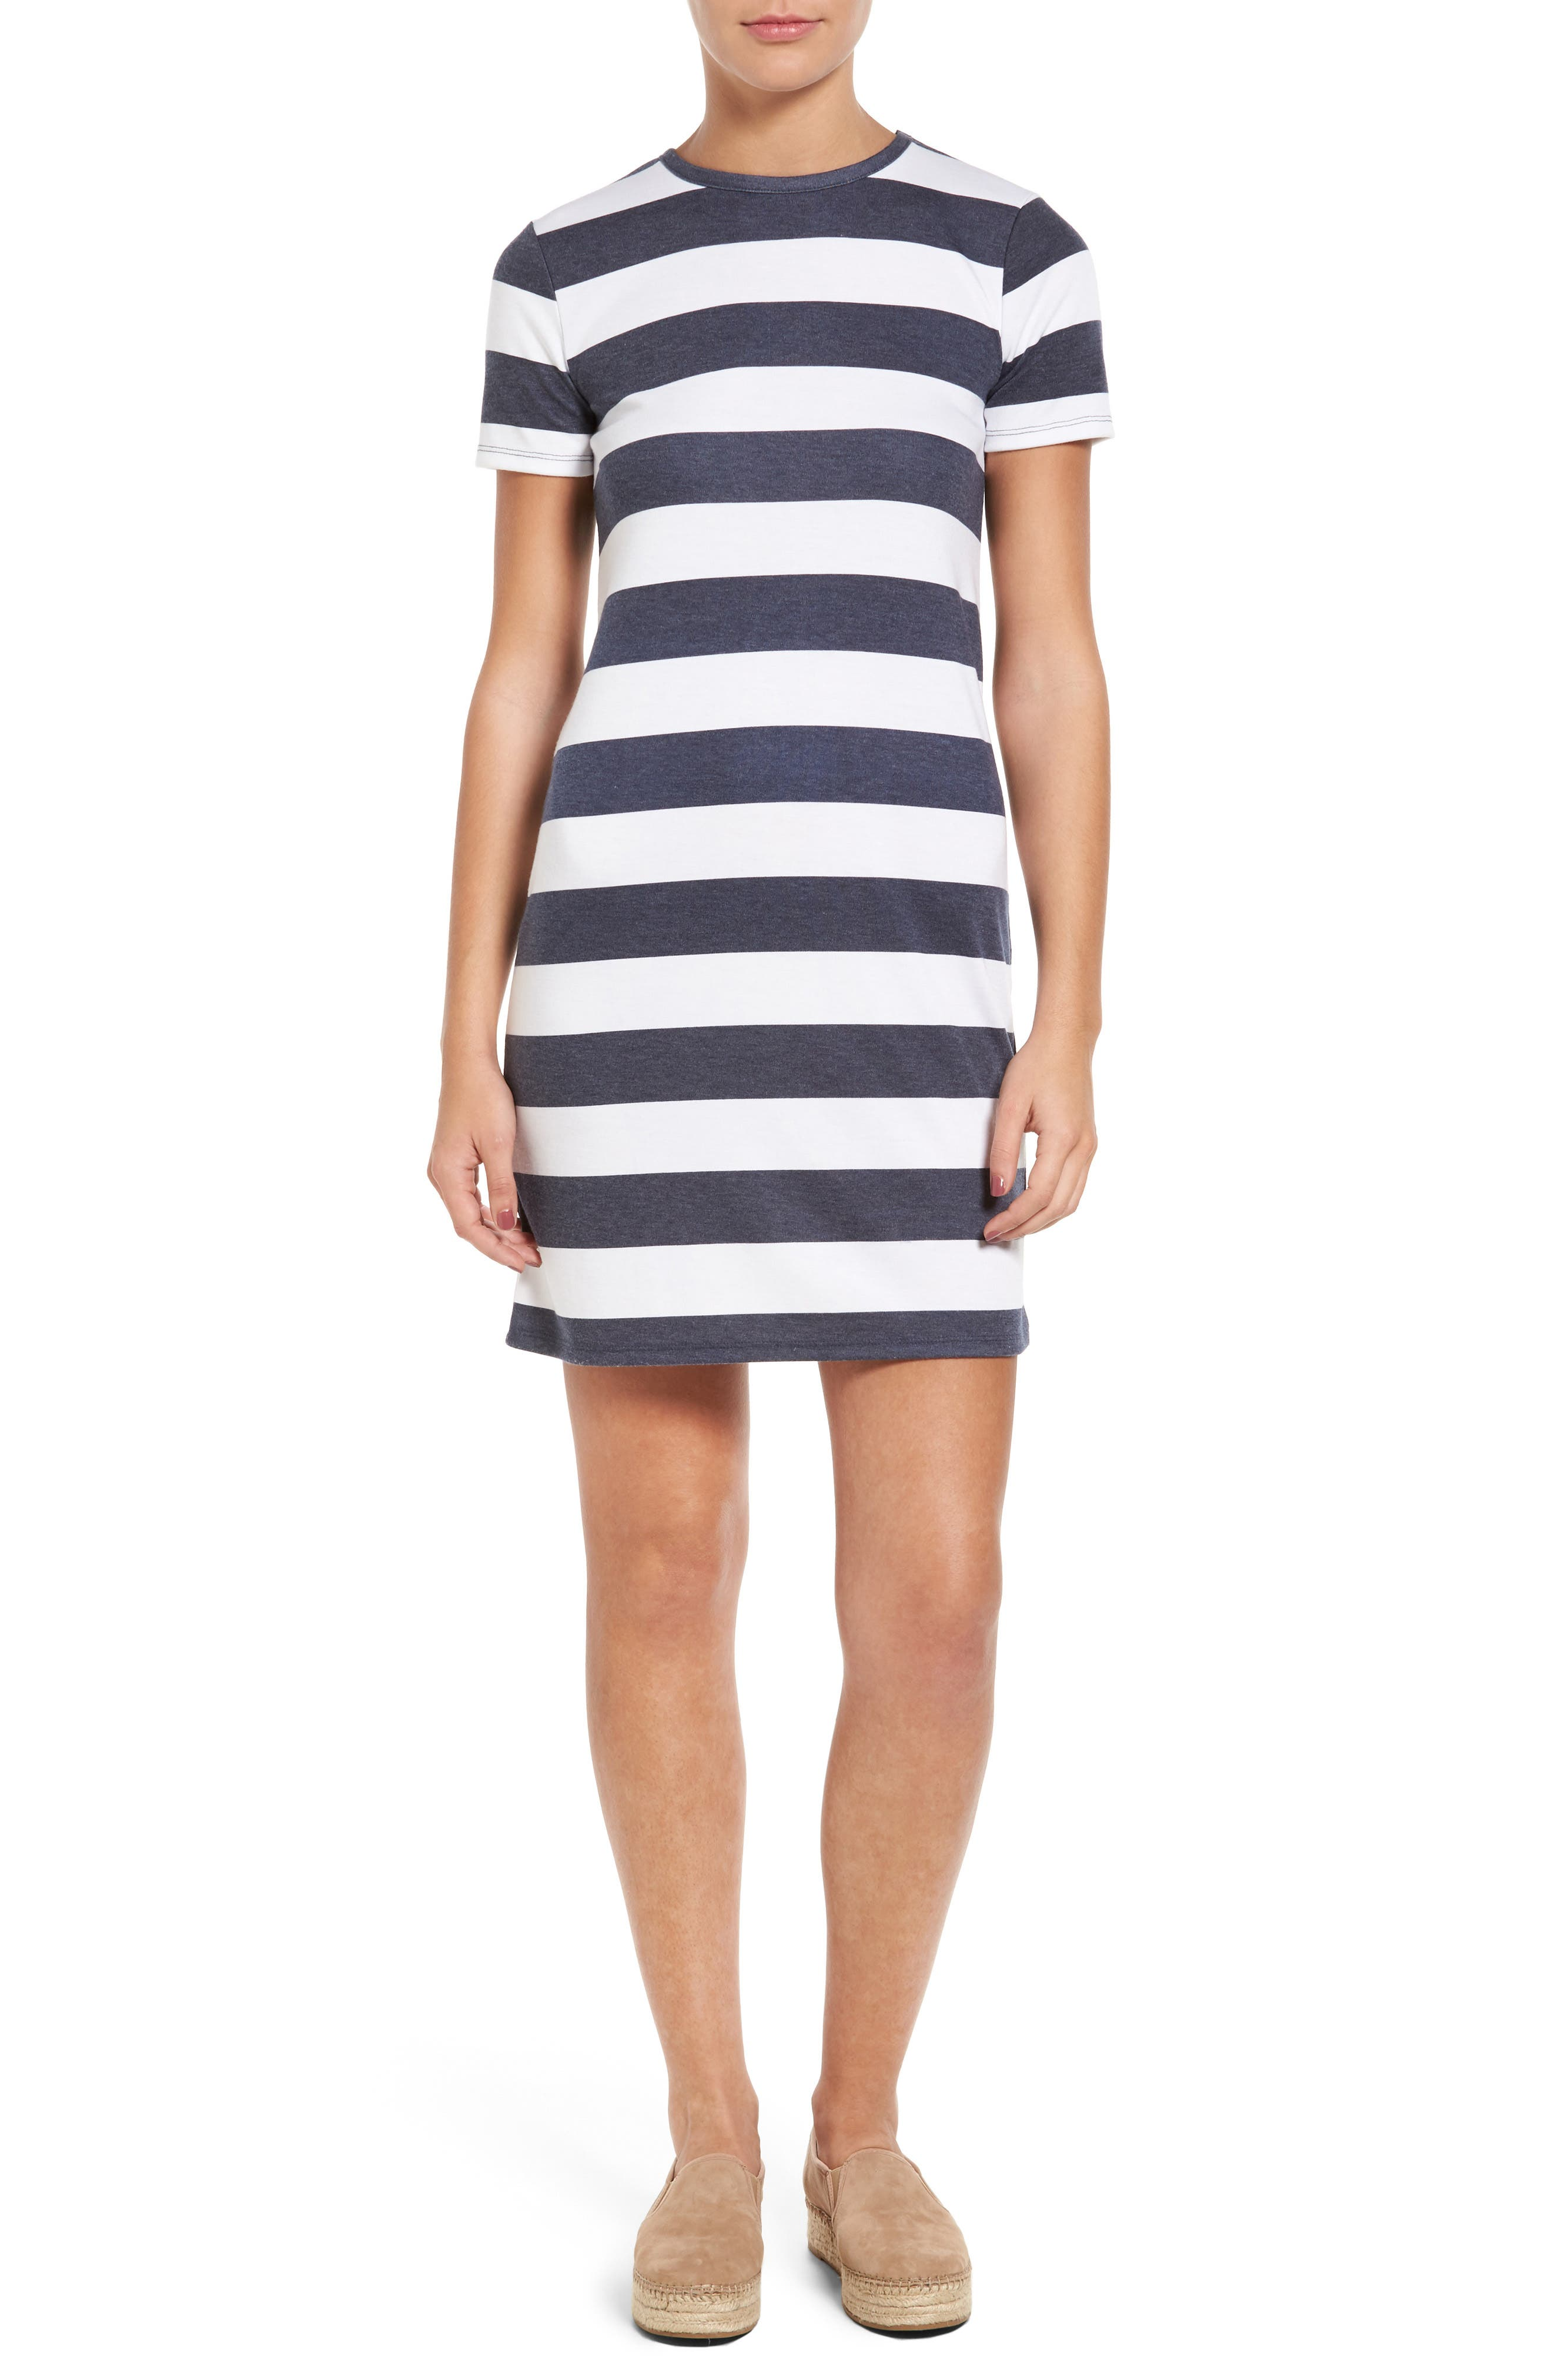 Alternate Image 1 Selected - MICHAEL Michael Kors Rugby Stripe T-Shirt Dress (Regular & Petite)